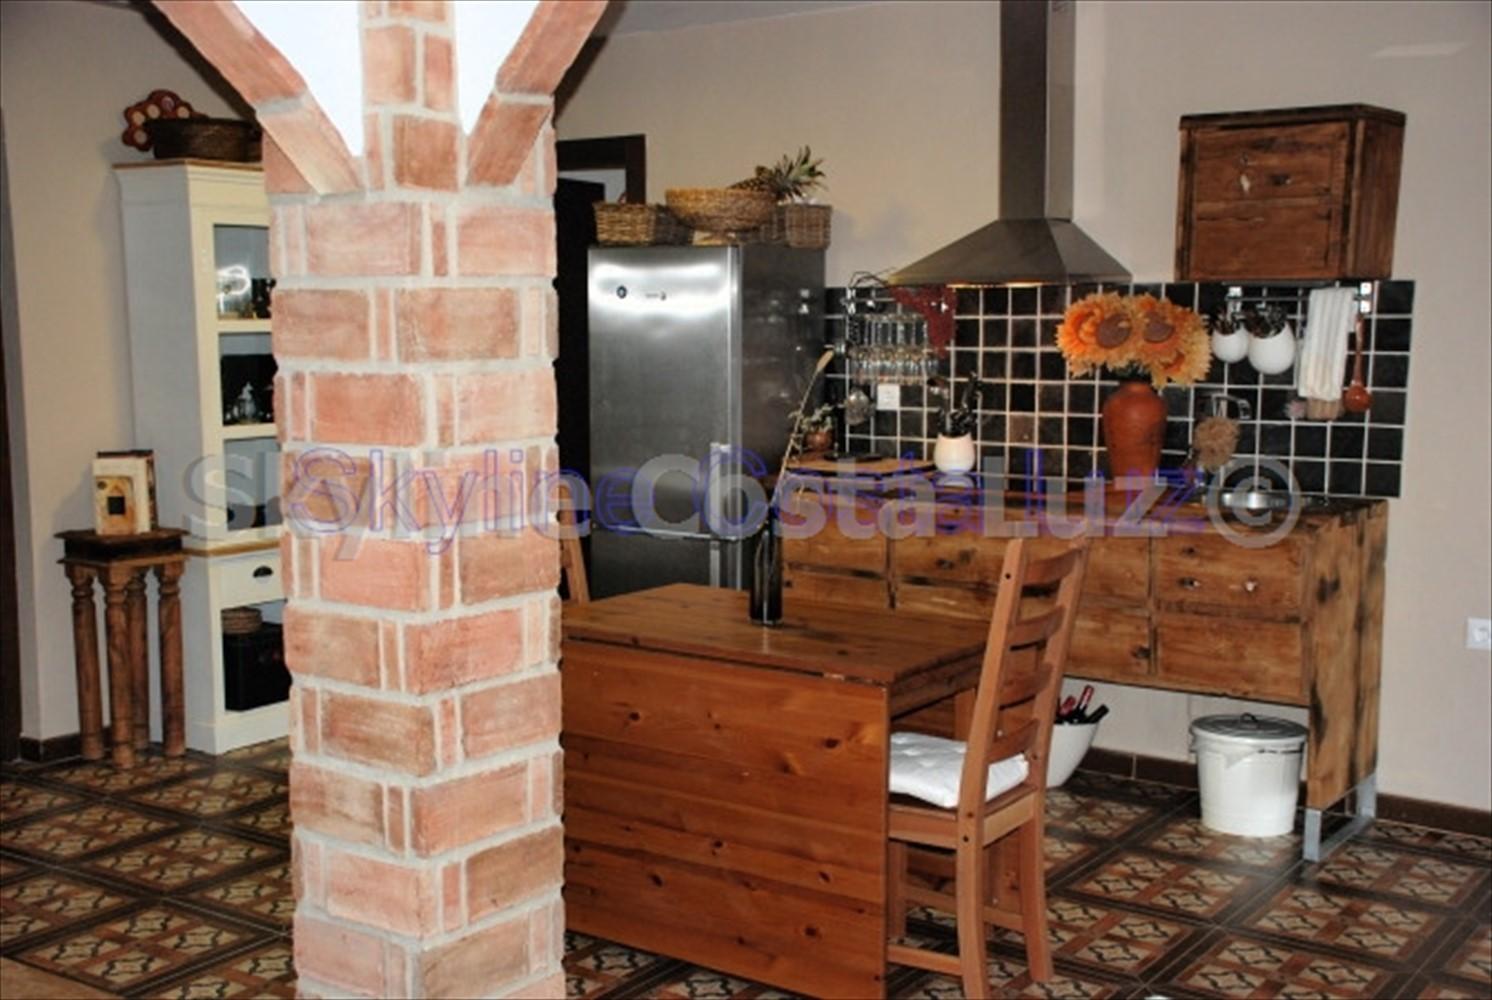 cocina, finca for sale in vejer, costa luz, id 1449